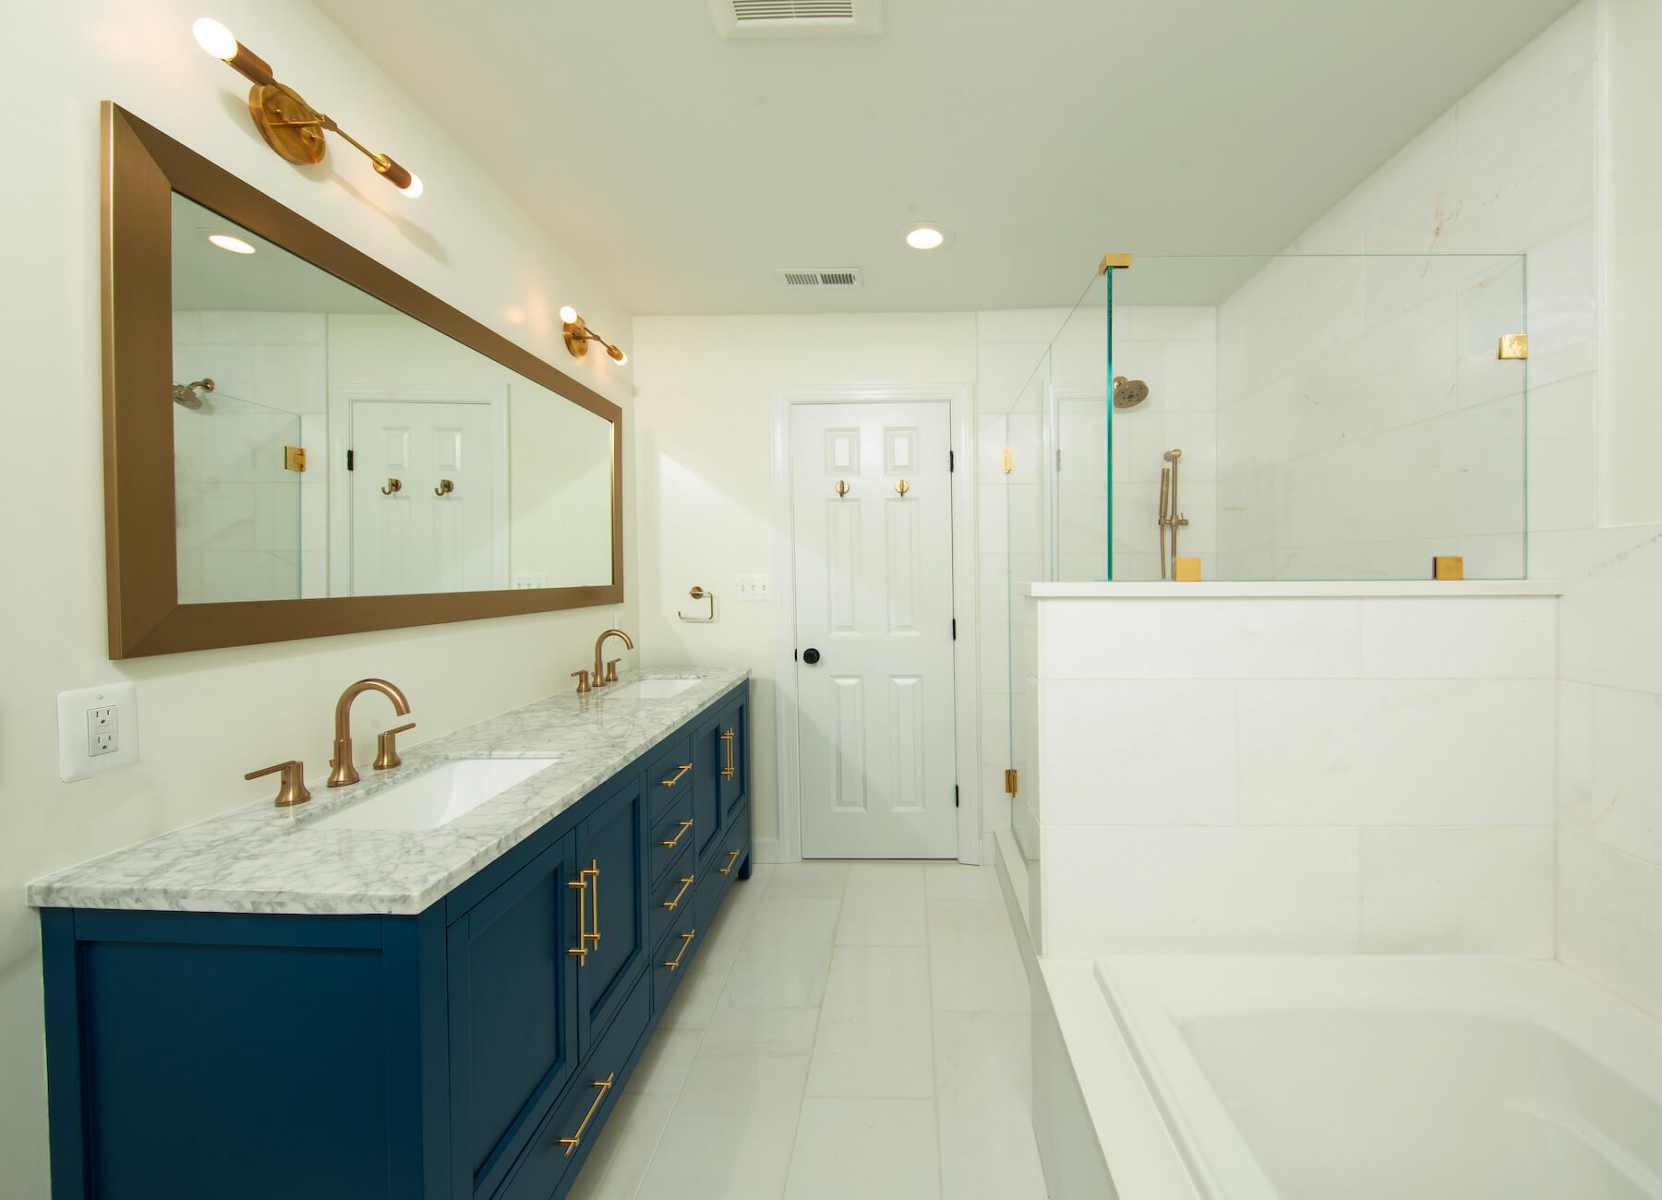 bathrooma_8-12-2019_793